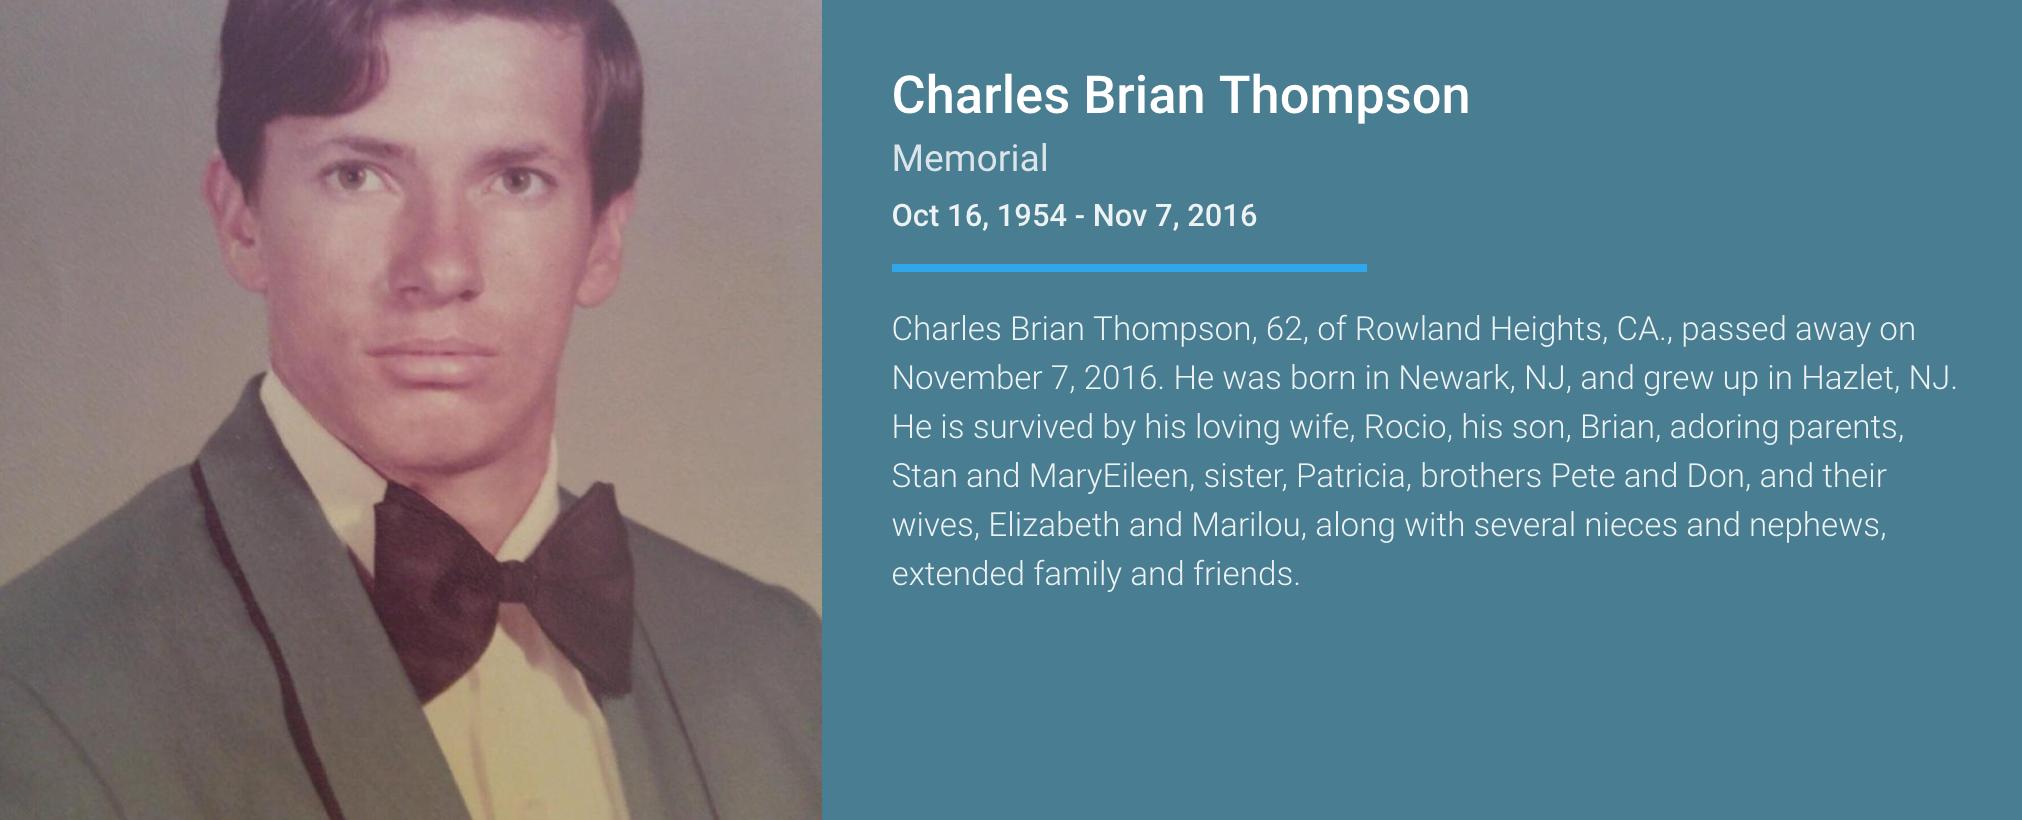 Charles Brian Thompson